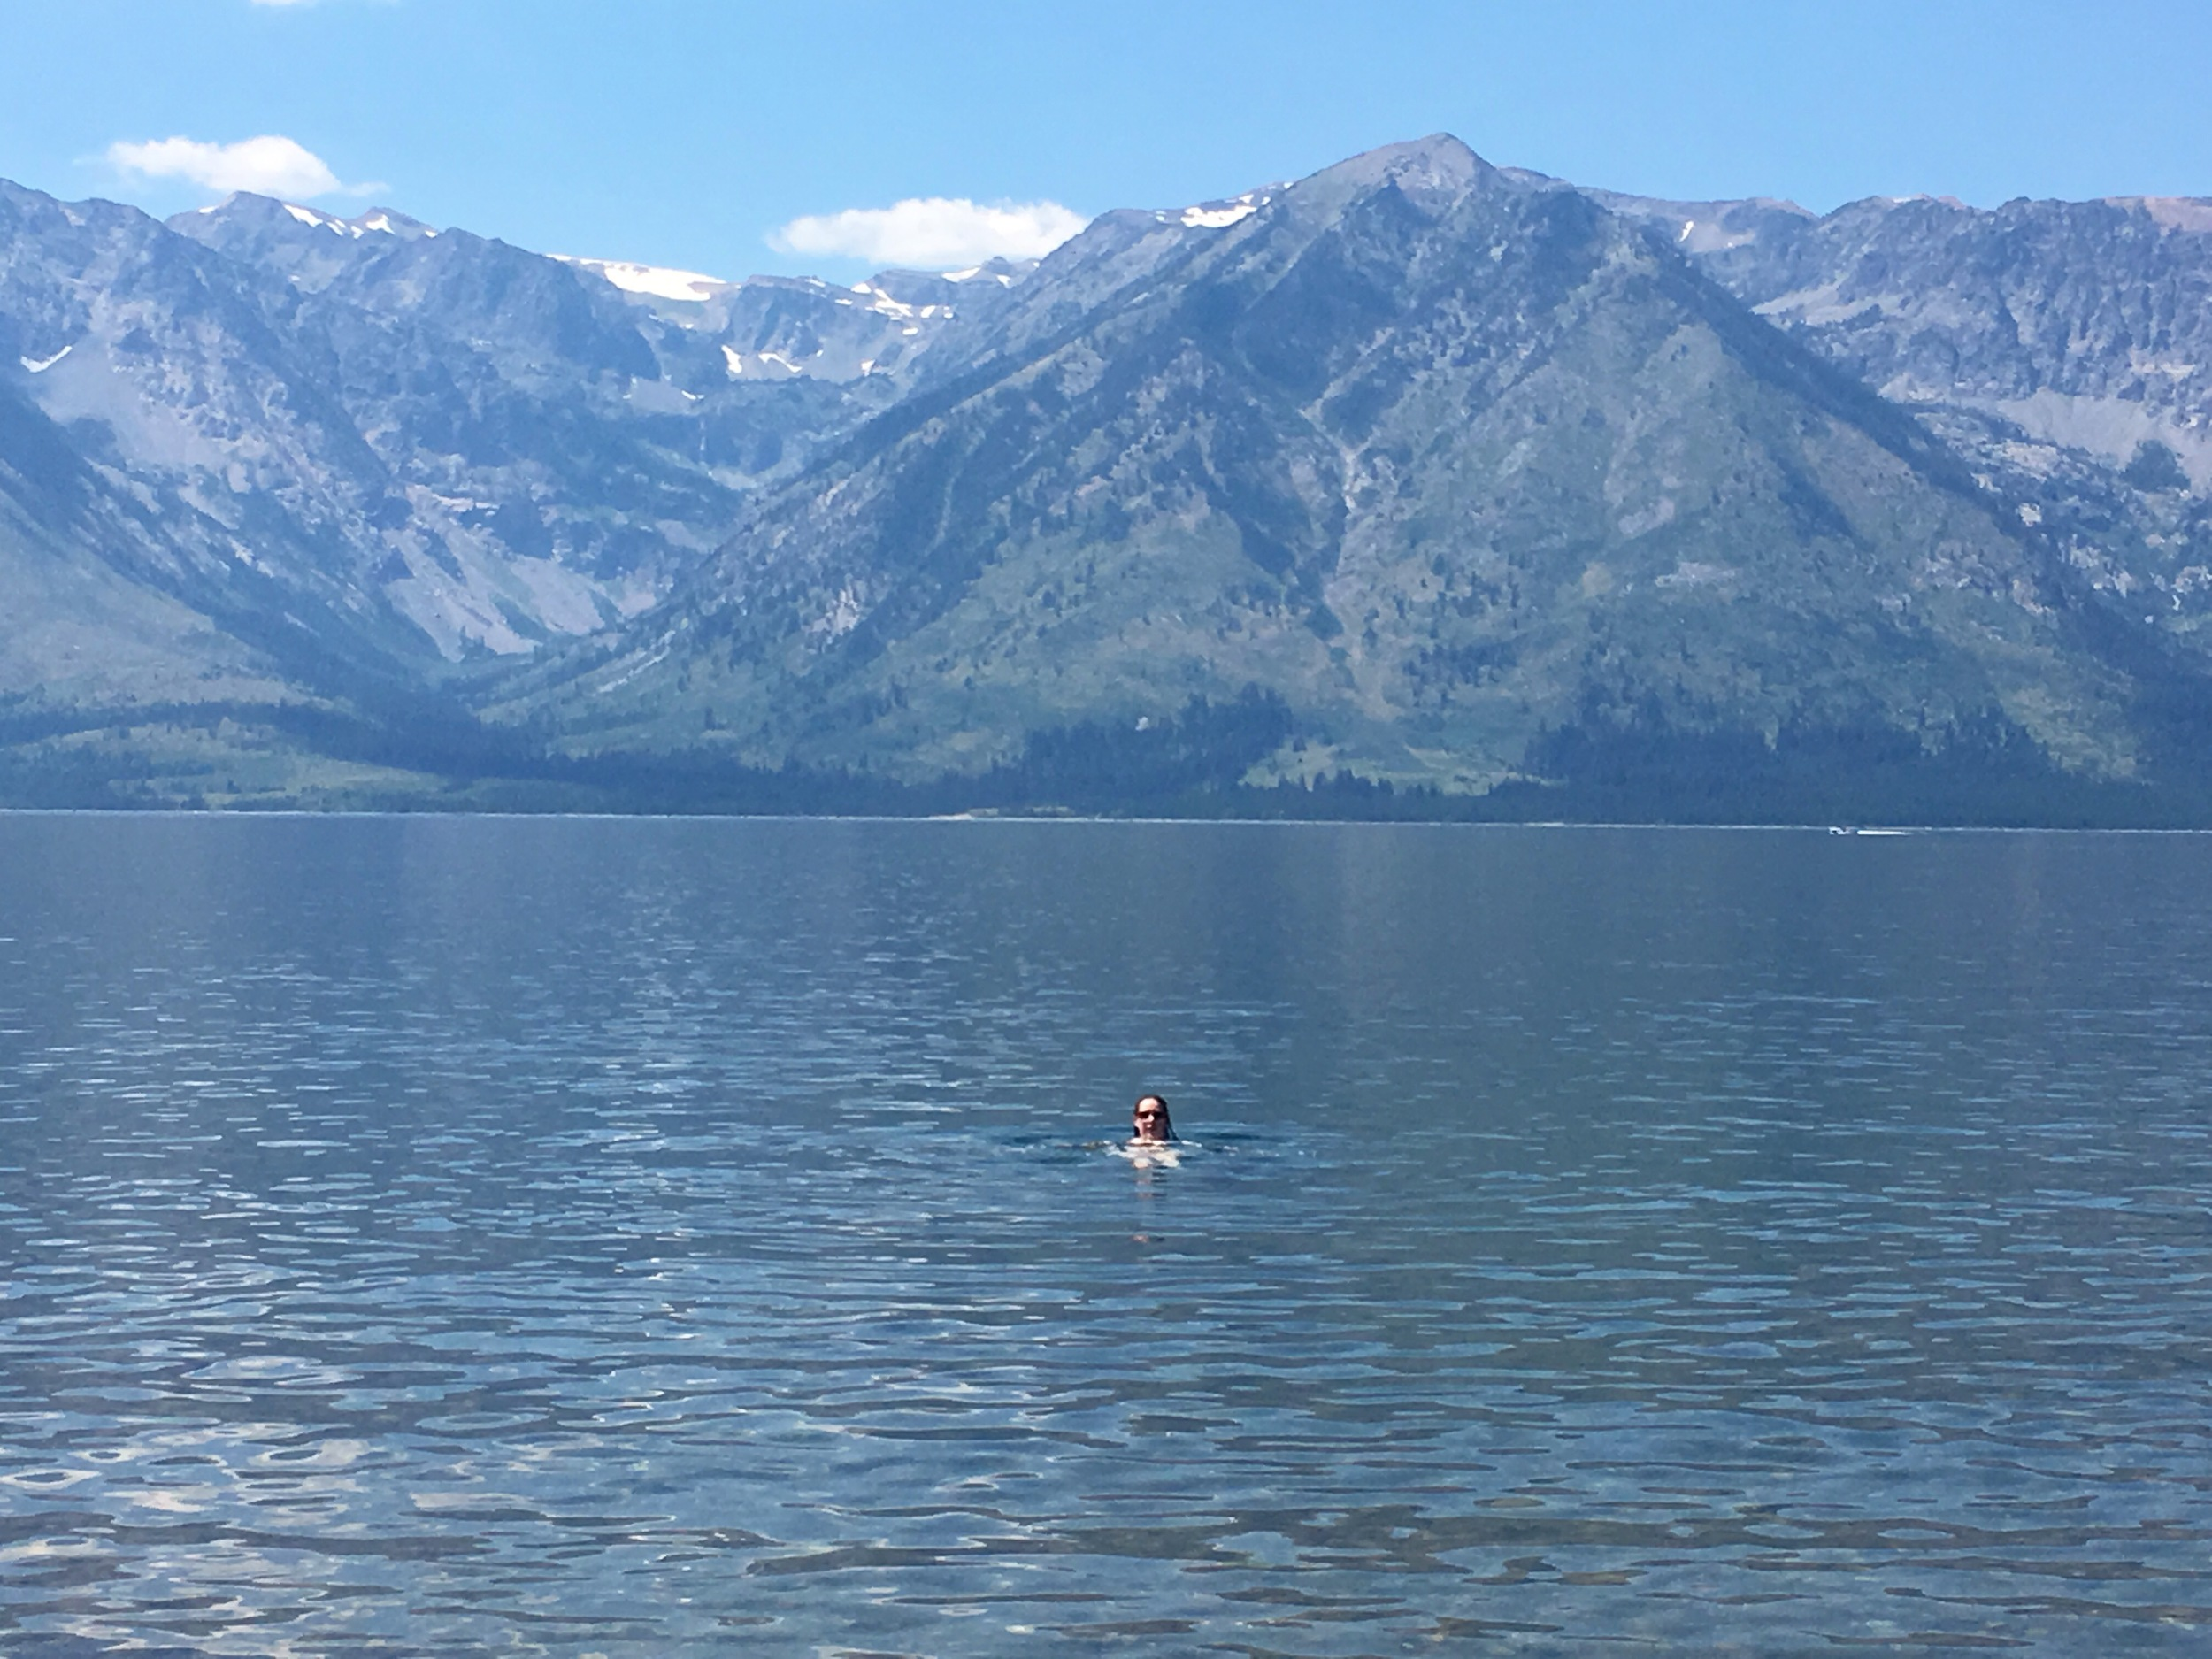 Liz enjoys a lake splash.